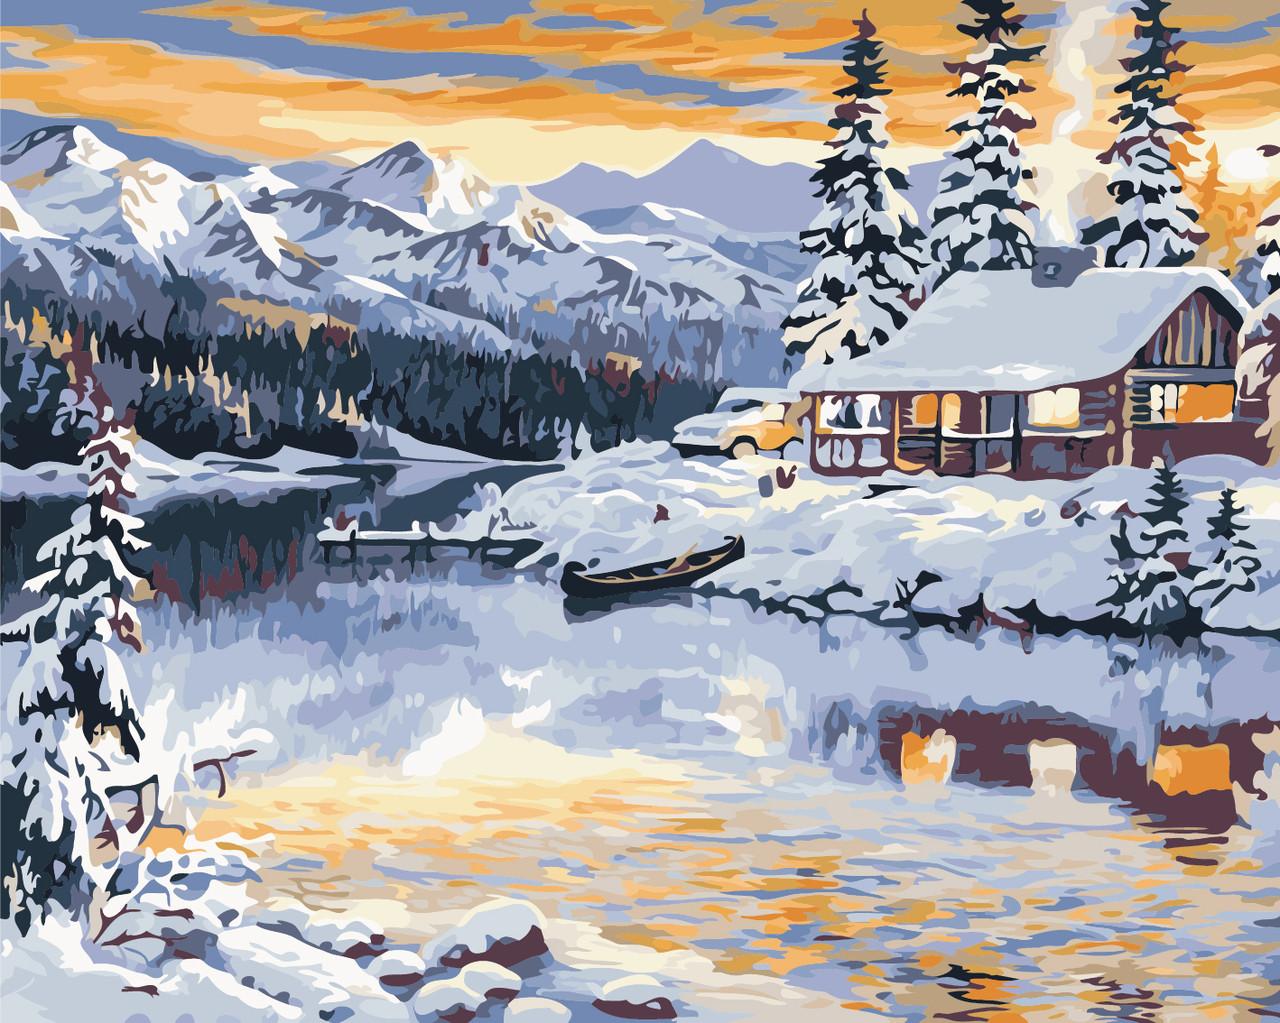 Картина по номерам Волшебная зима 40 х 50 см (AS0378)